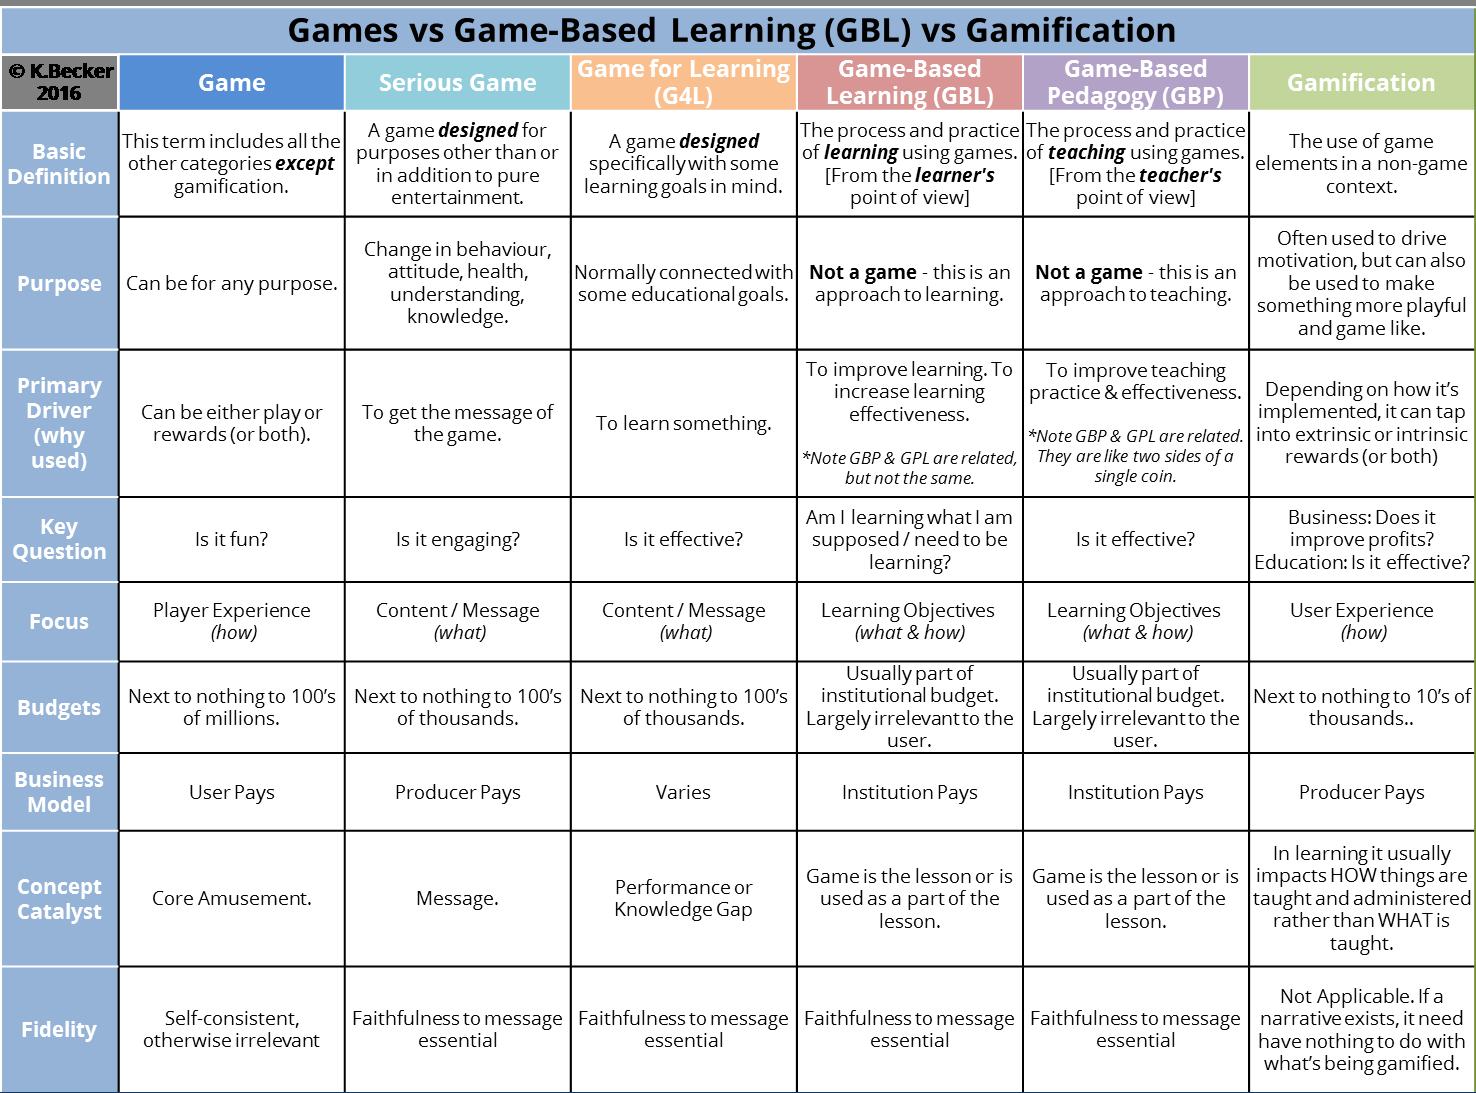 Games vs Game-Based Learning (GBL) vs Gamification V2